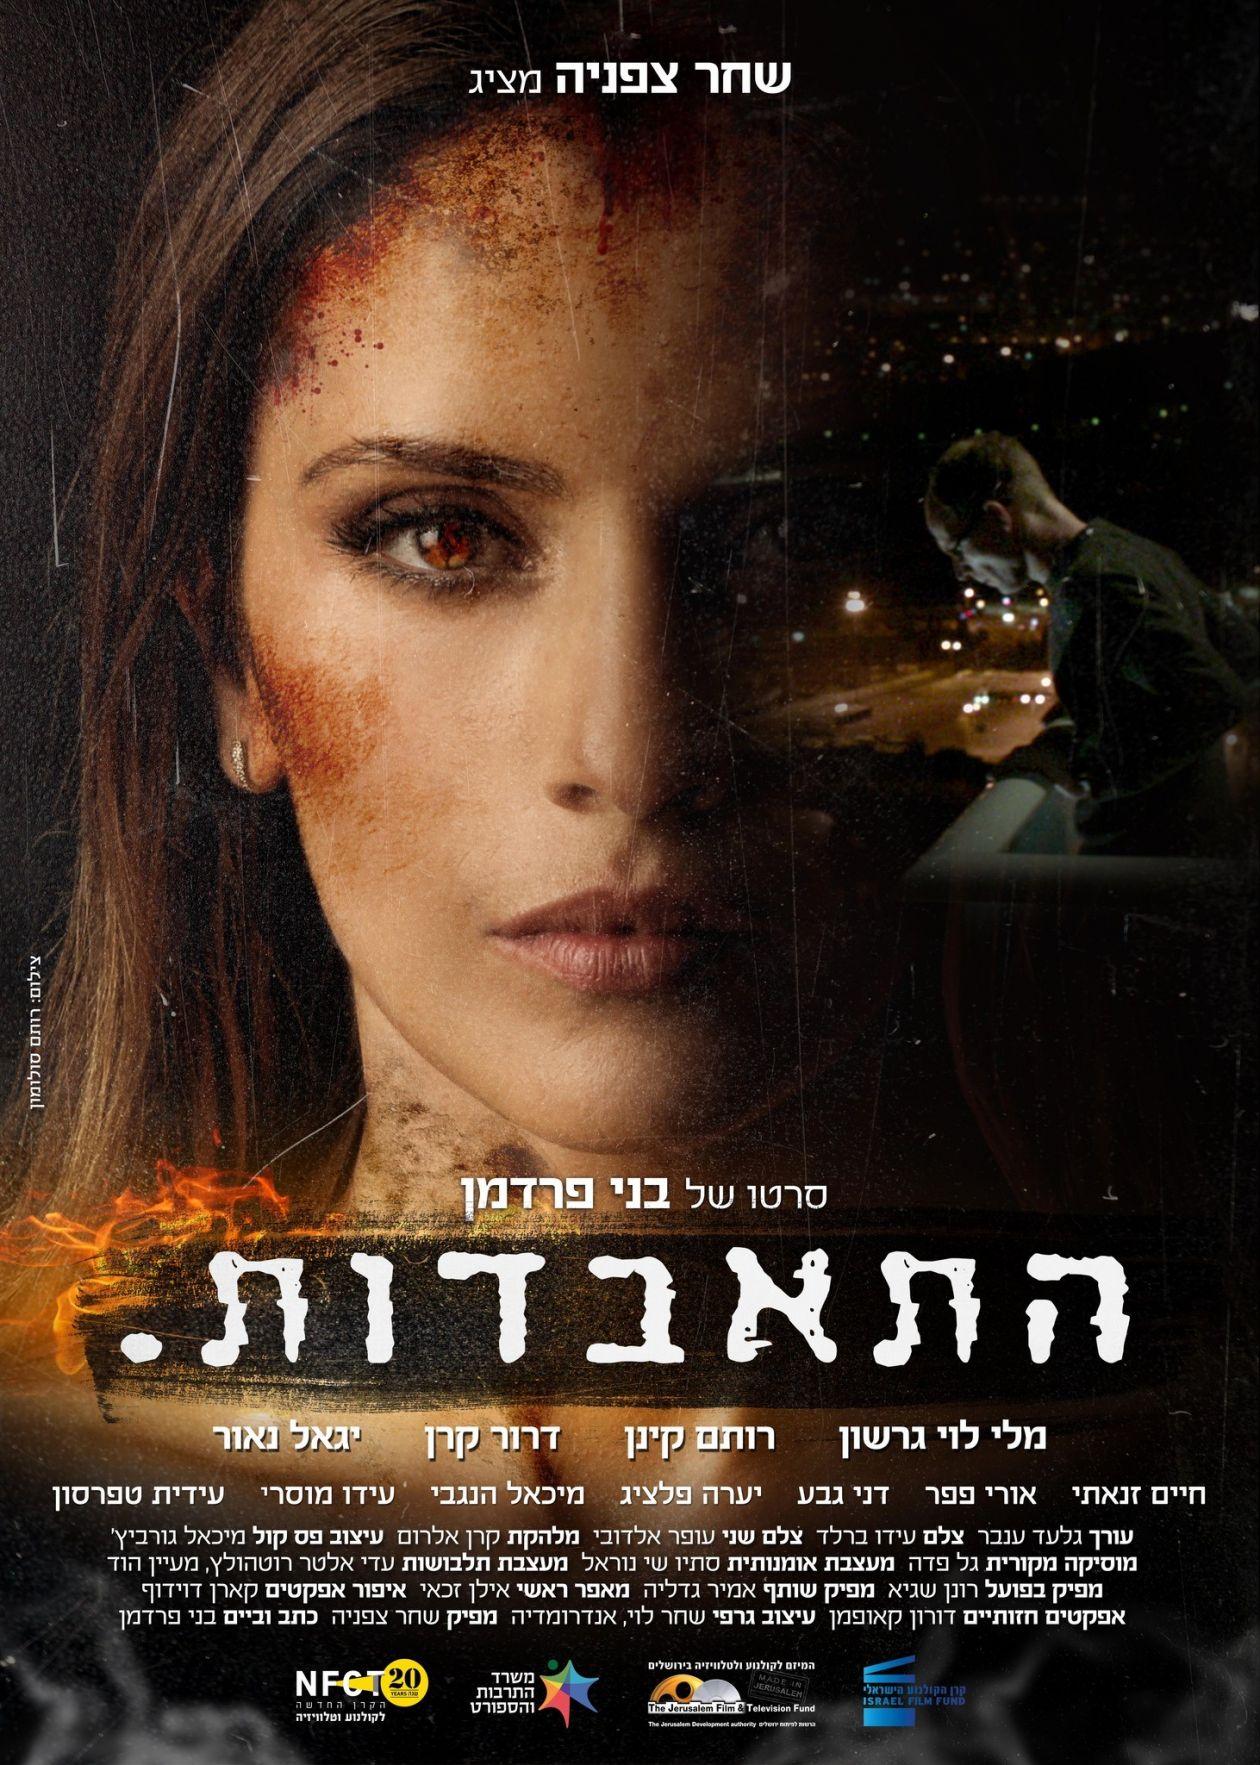 Mali Levi actress / Dafna | Suicide / Hitabdut / Benny Fredman 2015 Movie Poster Affiche film